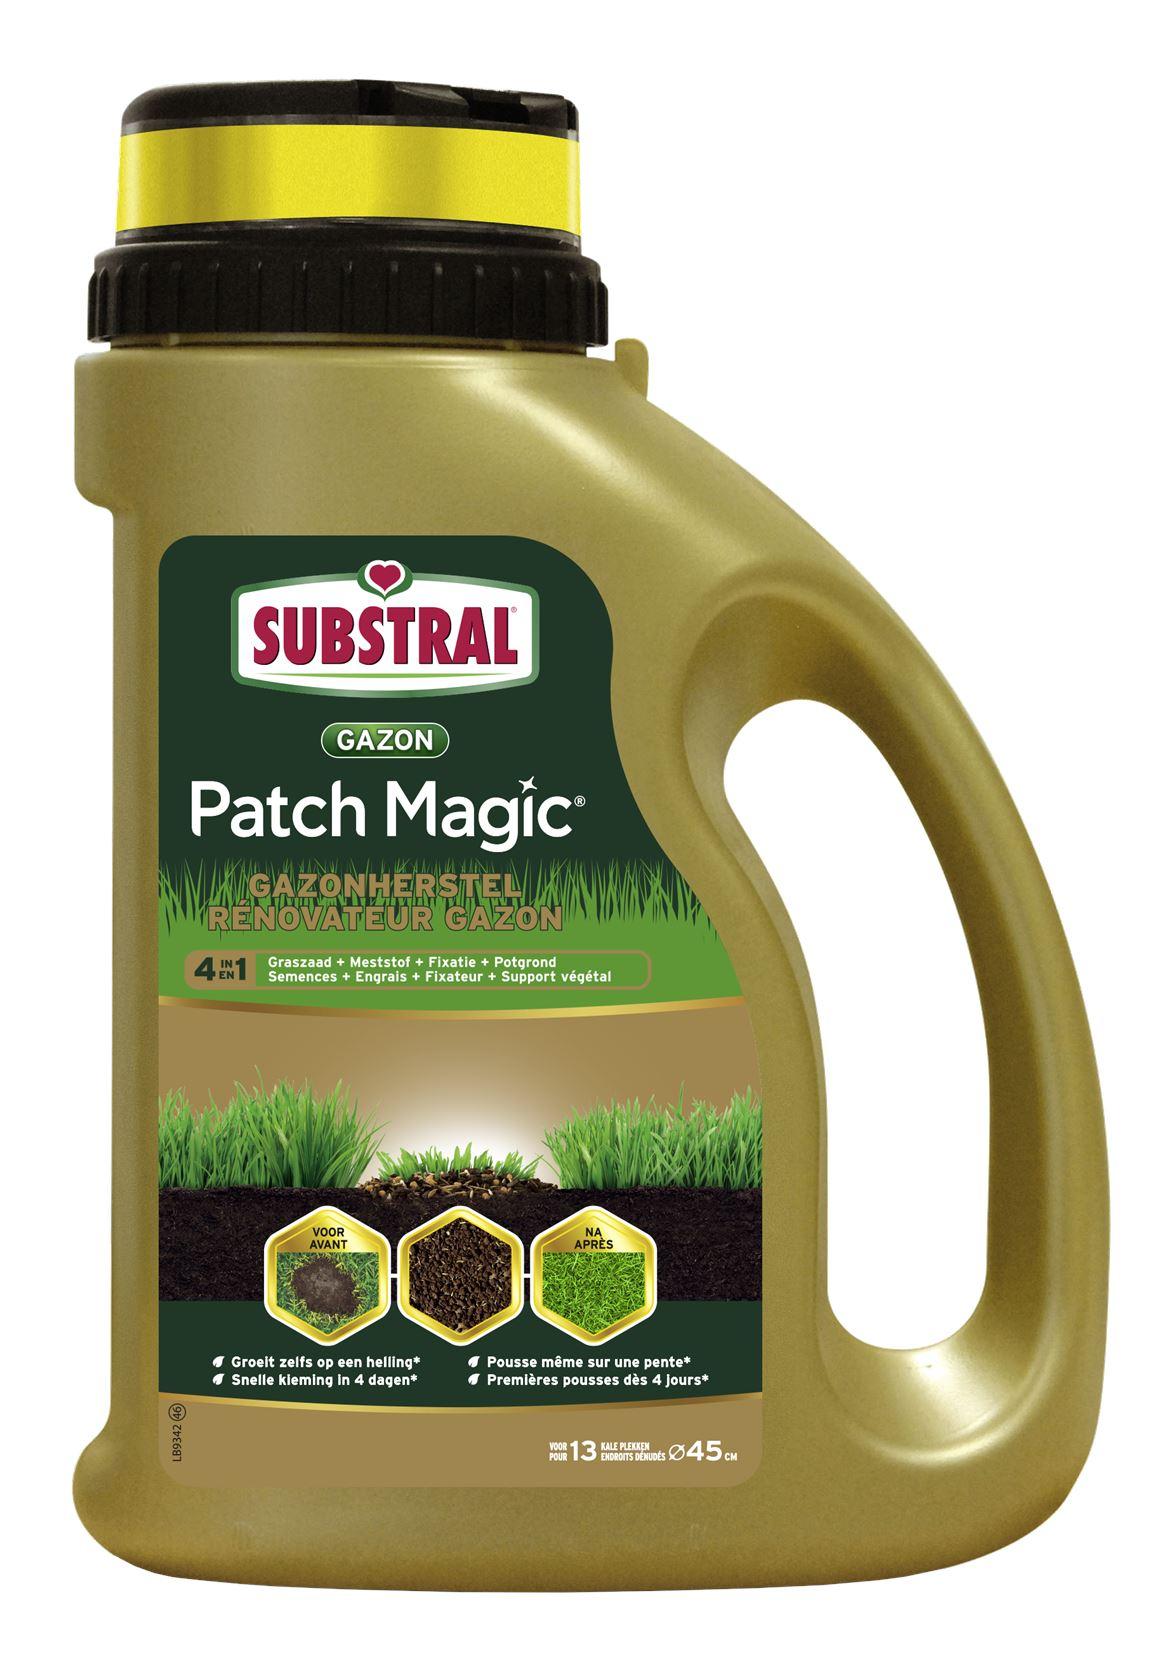 Substral-Patch-Magic-Gazonherstel-4-In-1-1kg